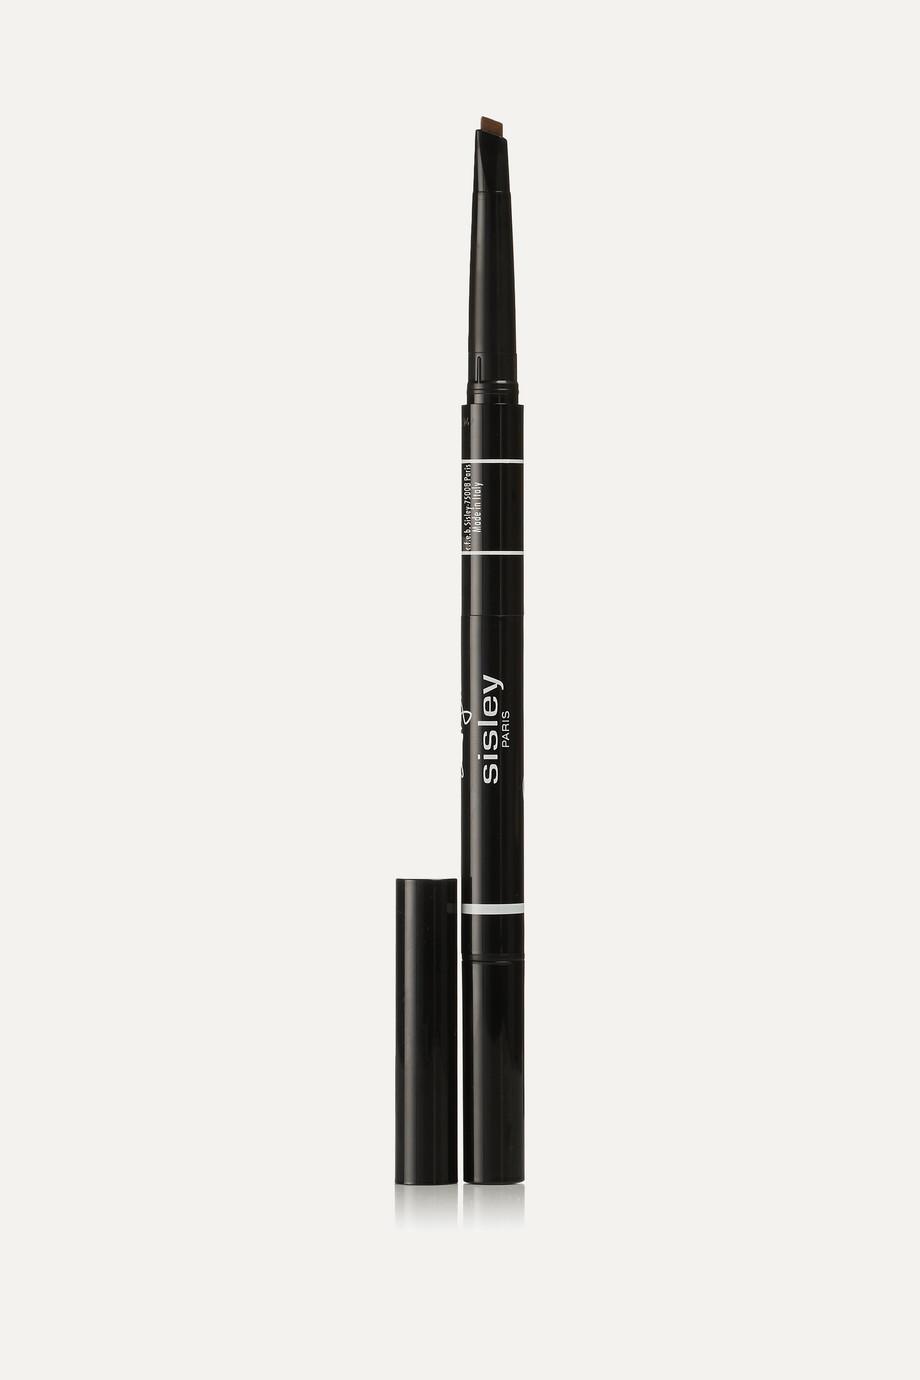 Sisley Phyto-Sourcils Design 3-in-1 Architect Pencil - 3 Brun